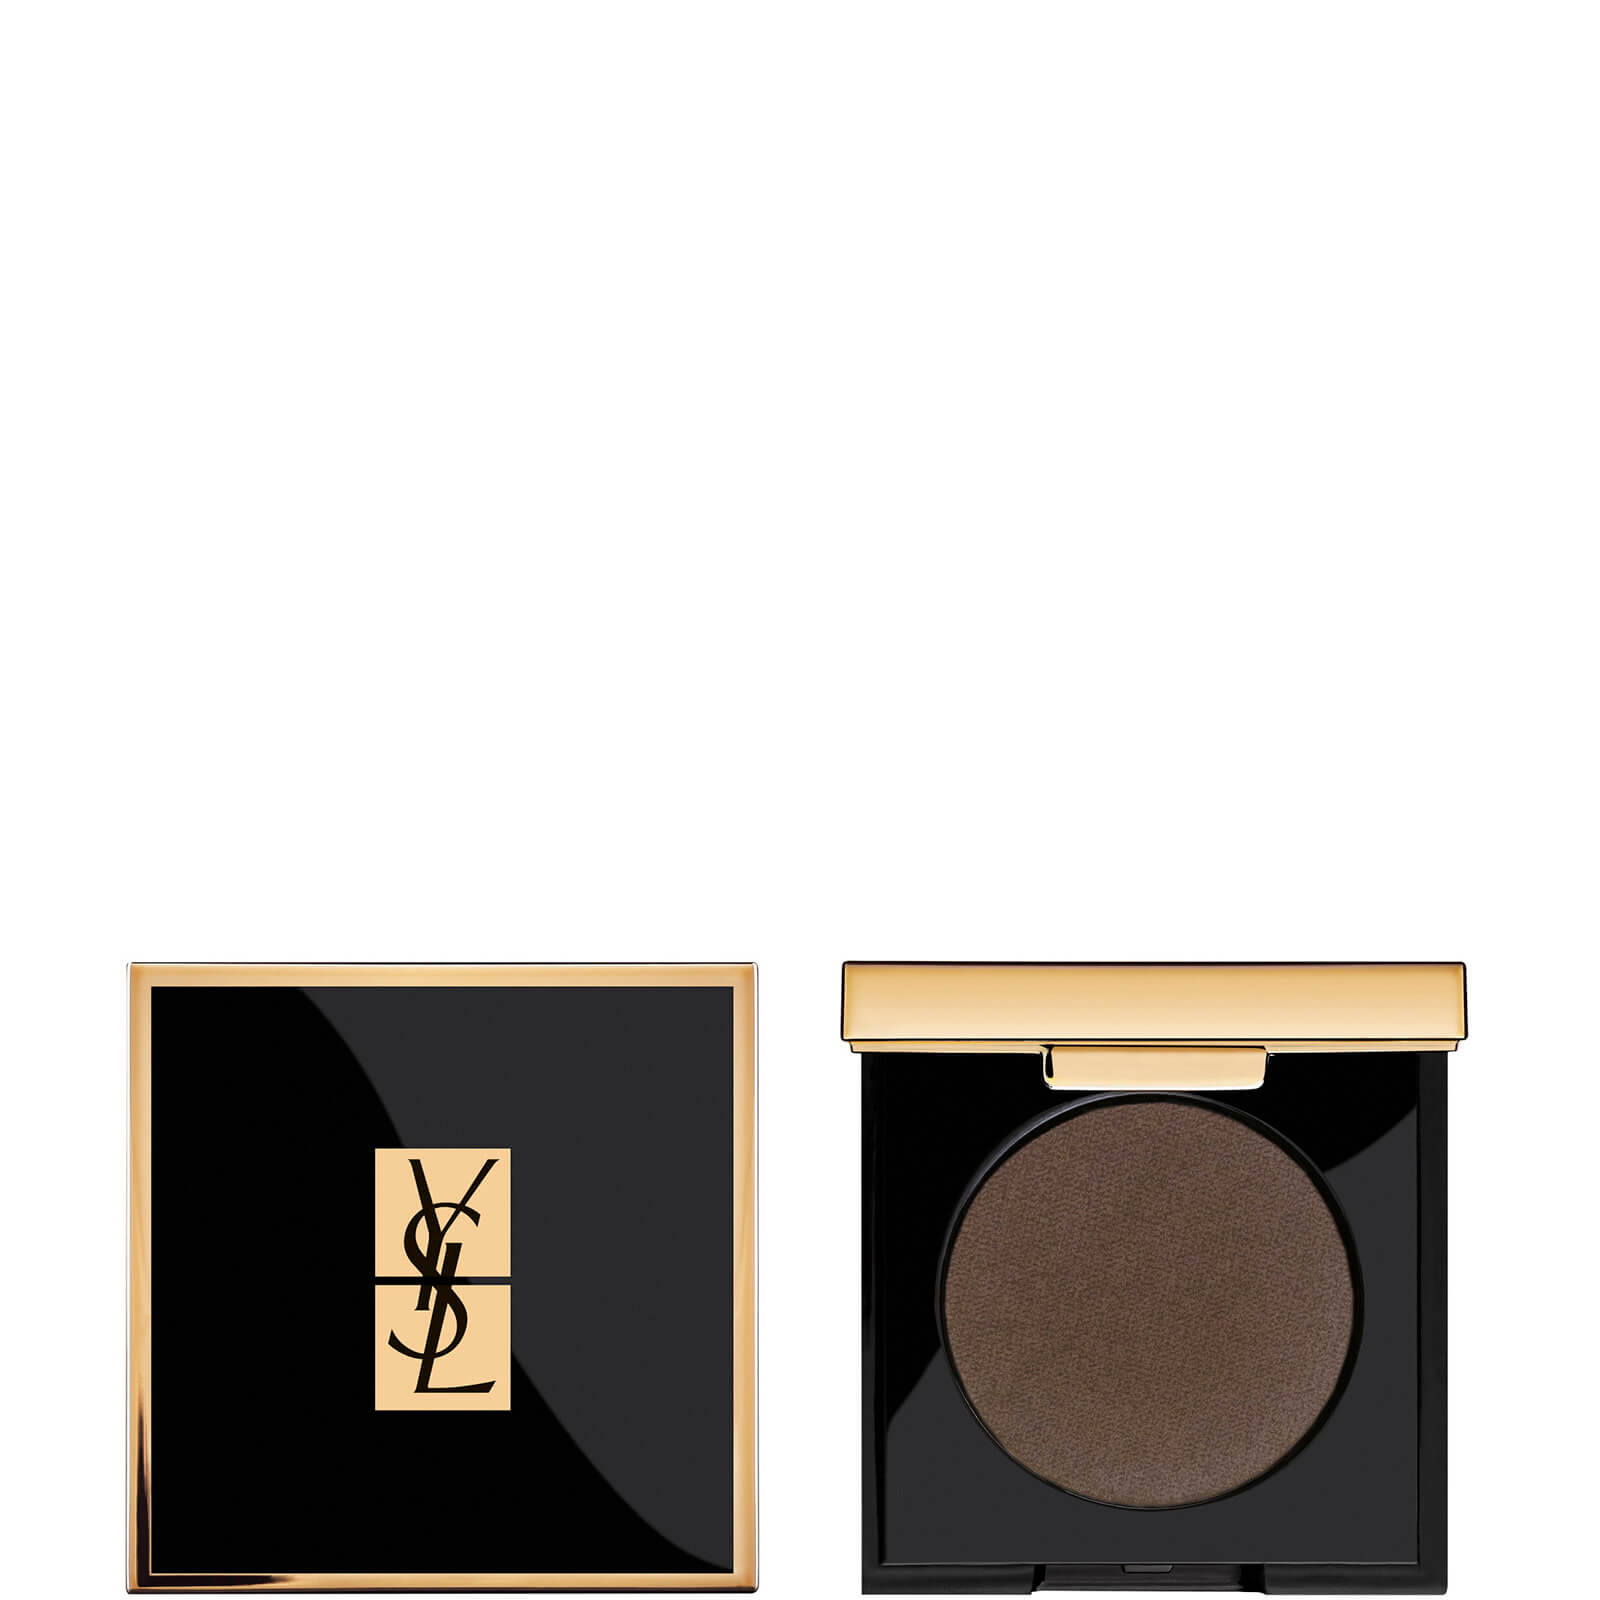 Купить Yves Saint Laurent Exclusive Couture Crush Mono Eyeshadow 10g (Various Shades) - #33